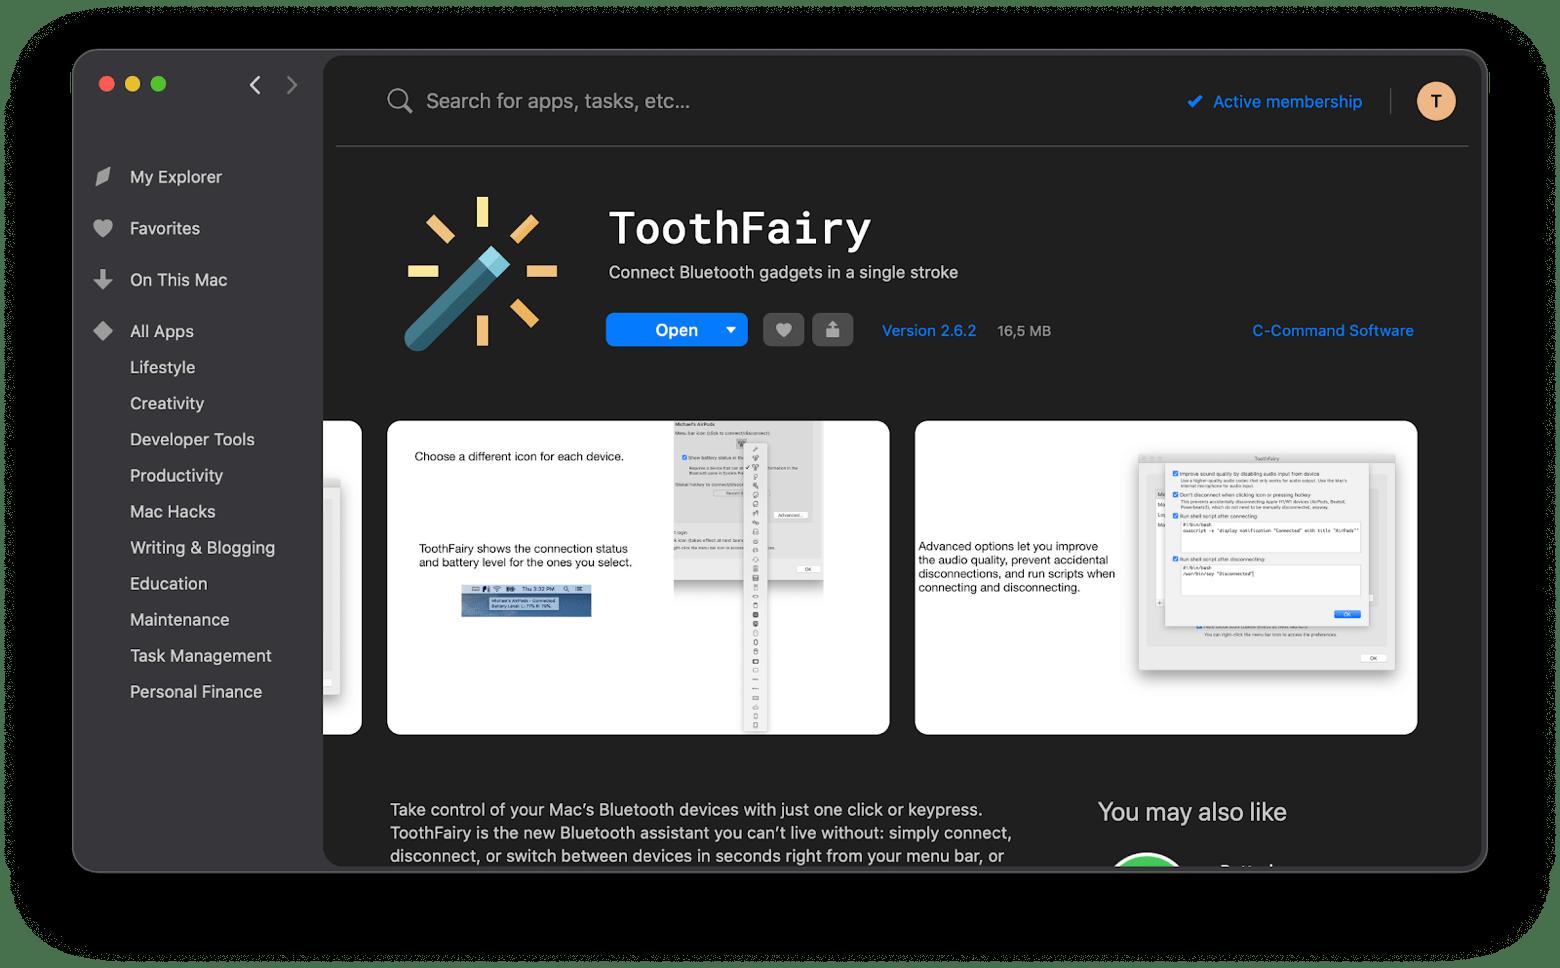 ToothFairy app